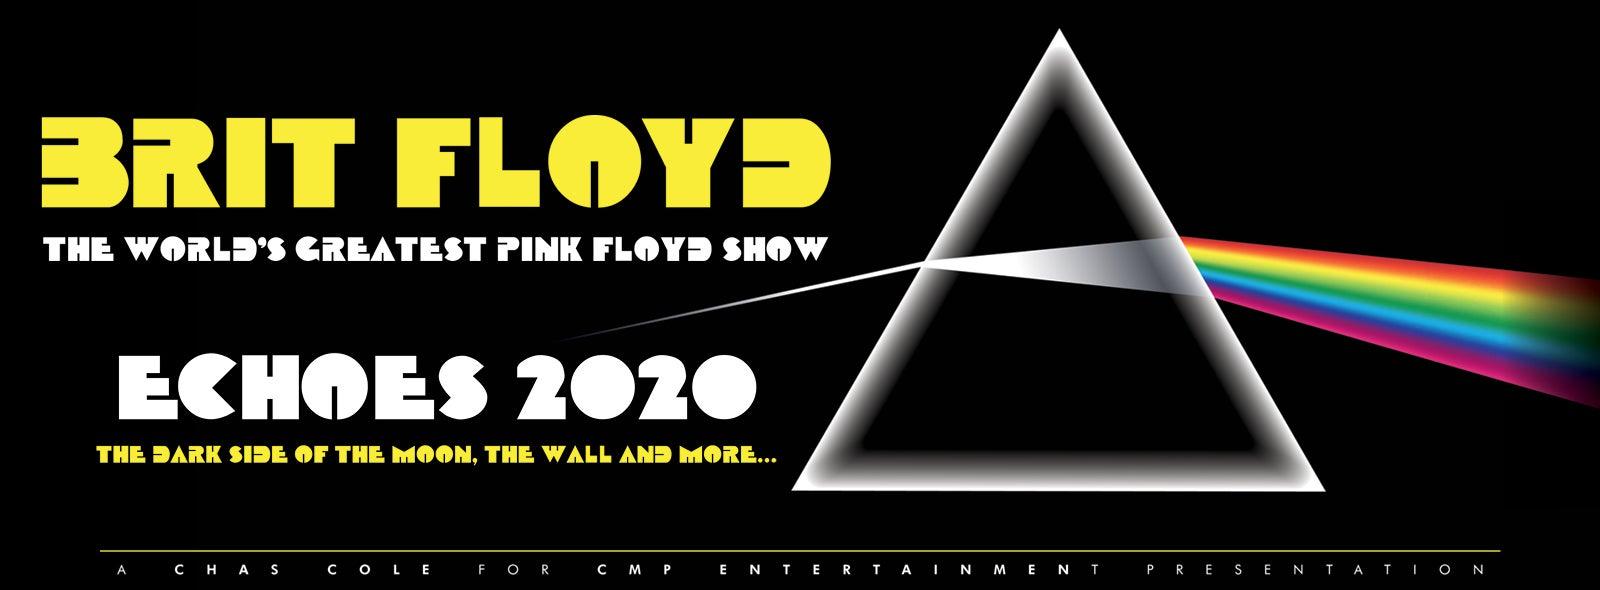 Brit Floyd Tour 2020.Brit Floyd Returns To Dpac On April 24 2020 Dpac Official